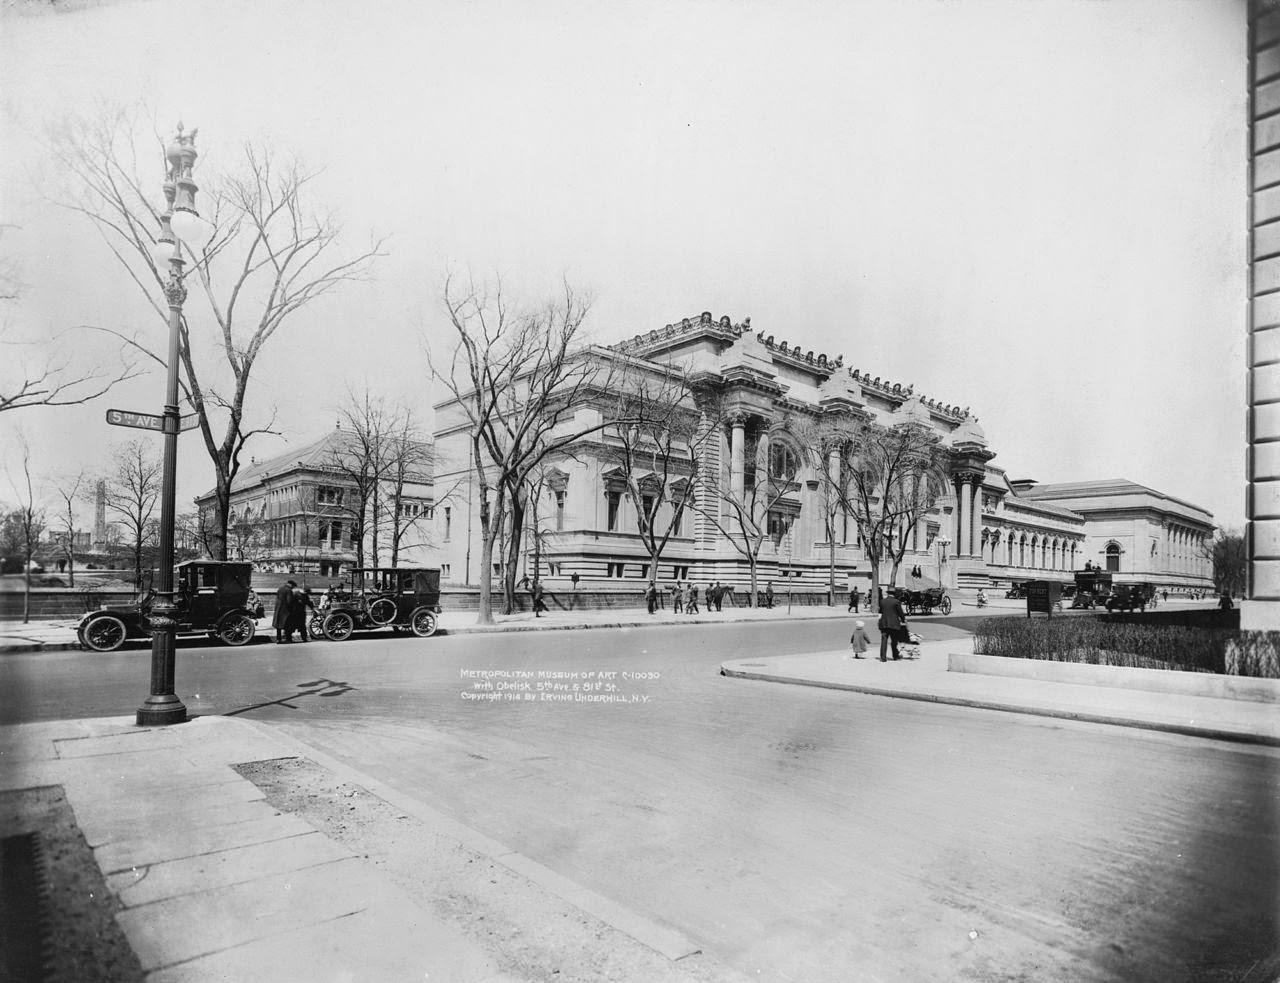 Metropolitan_Museum_circa_1914_LC-USZ62-